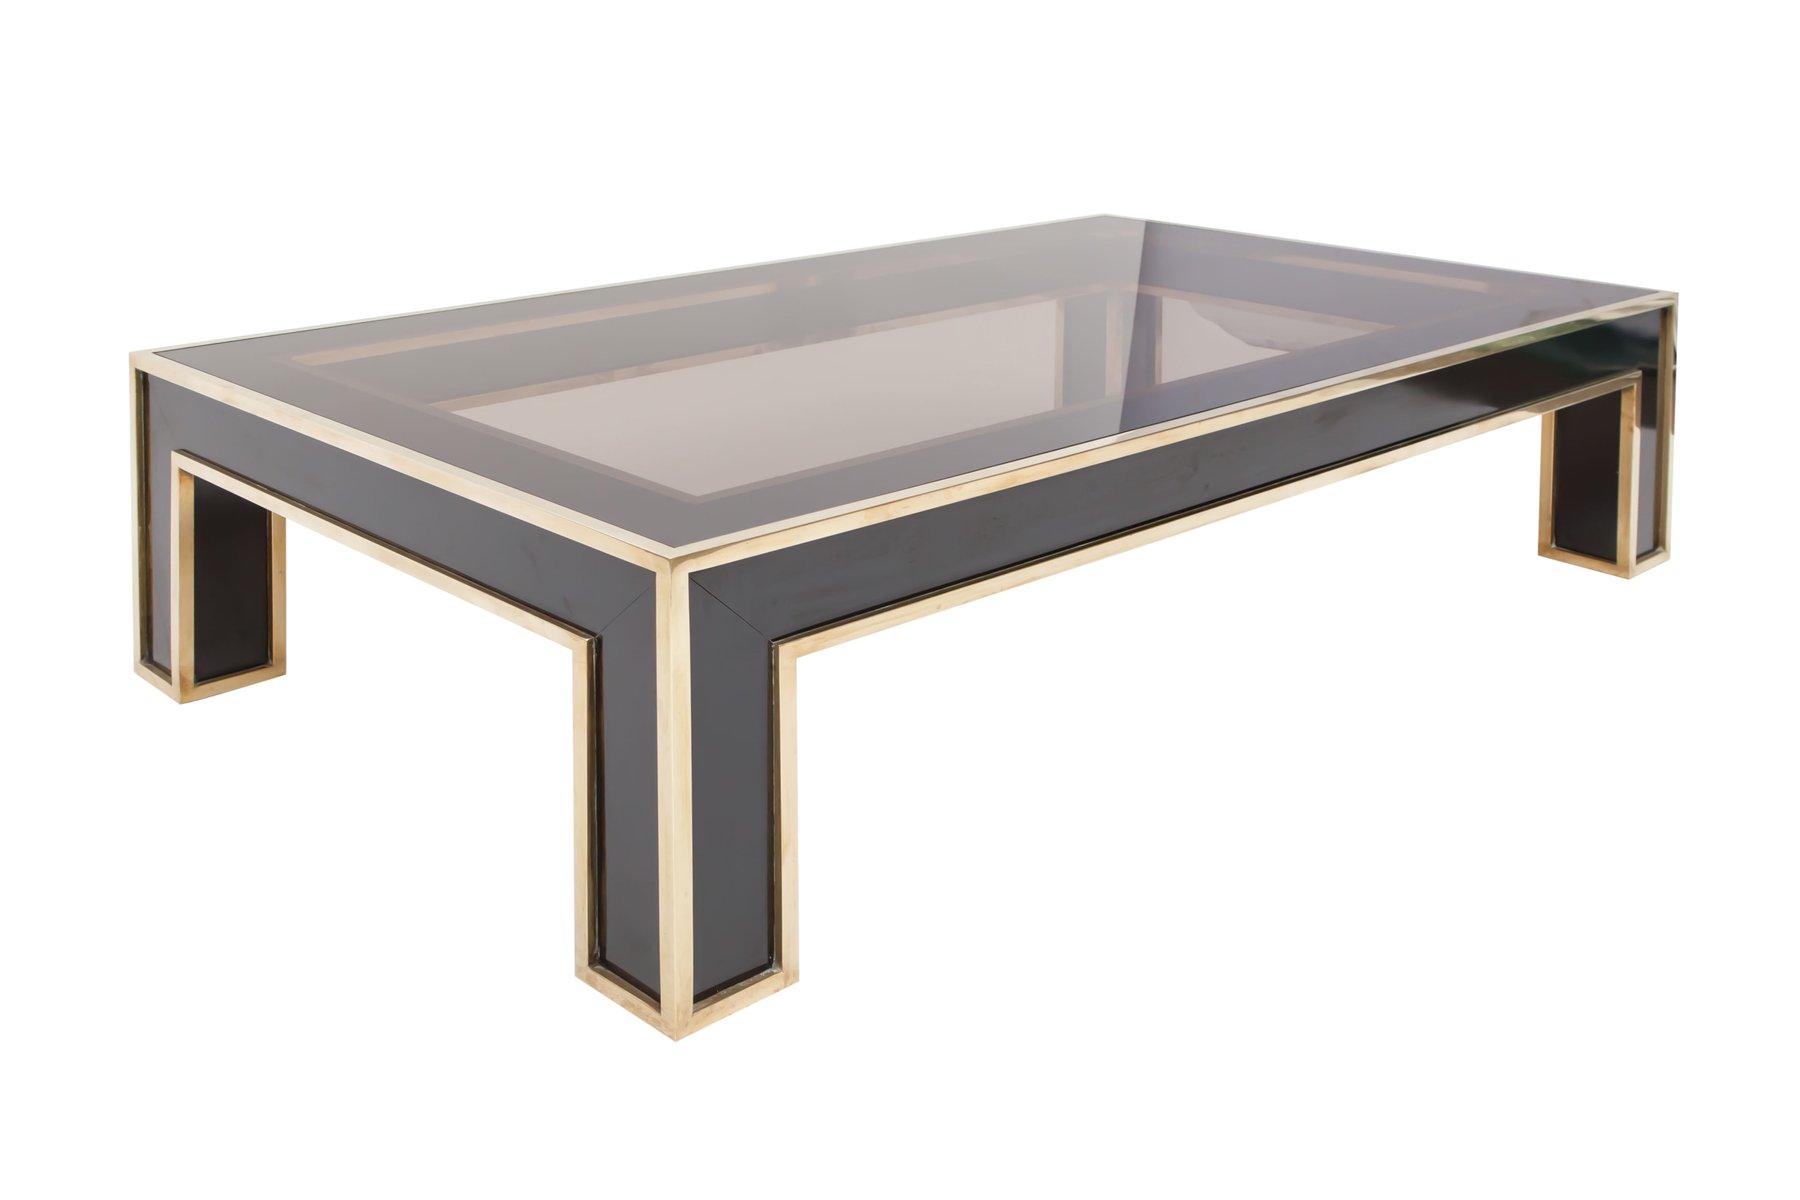 Rectangular Black Laminate & Brass Coffee Table by Romeo Rega